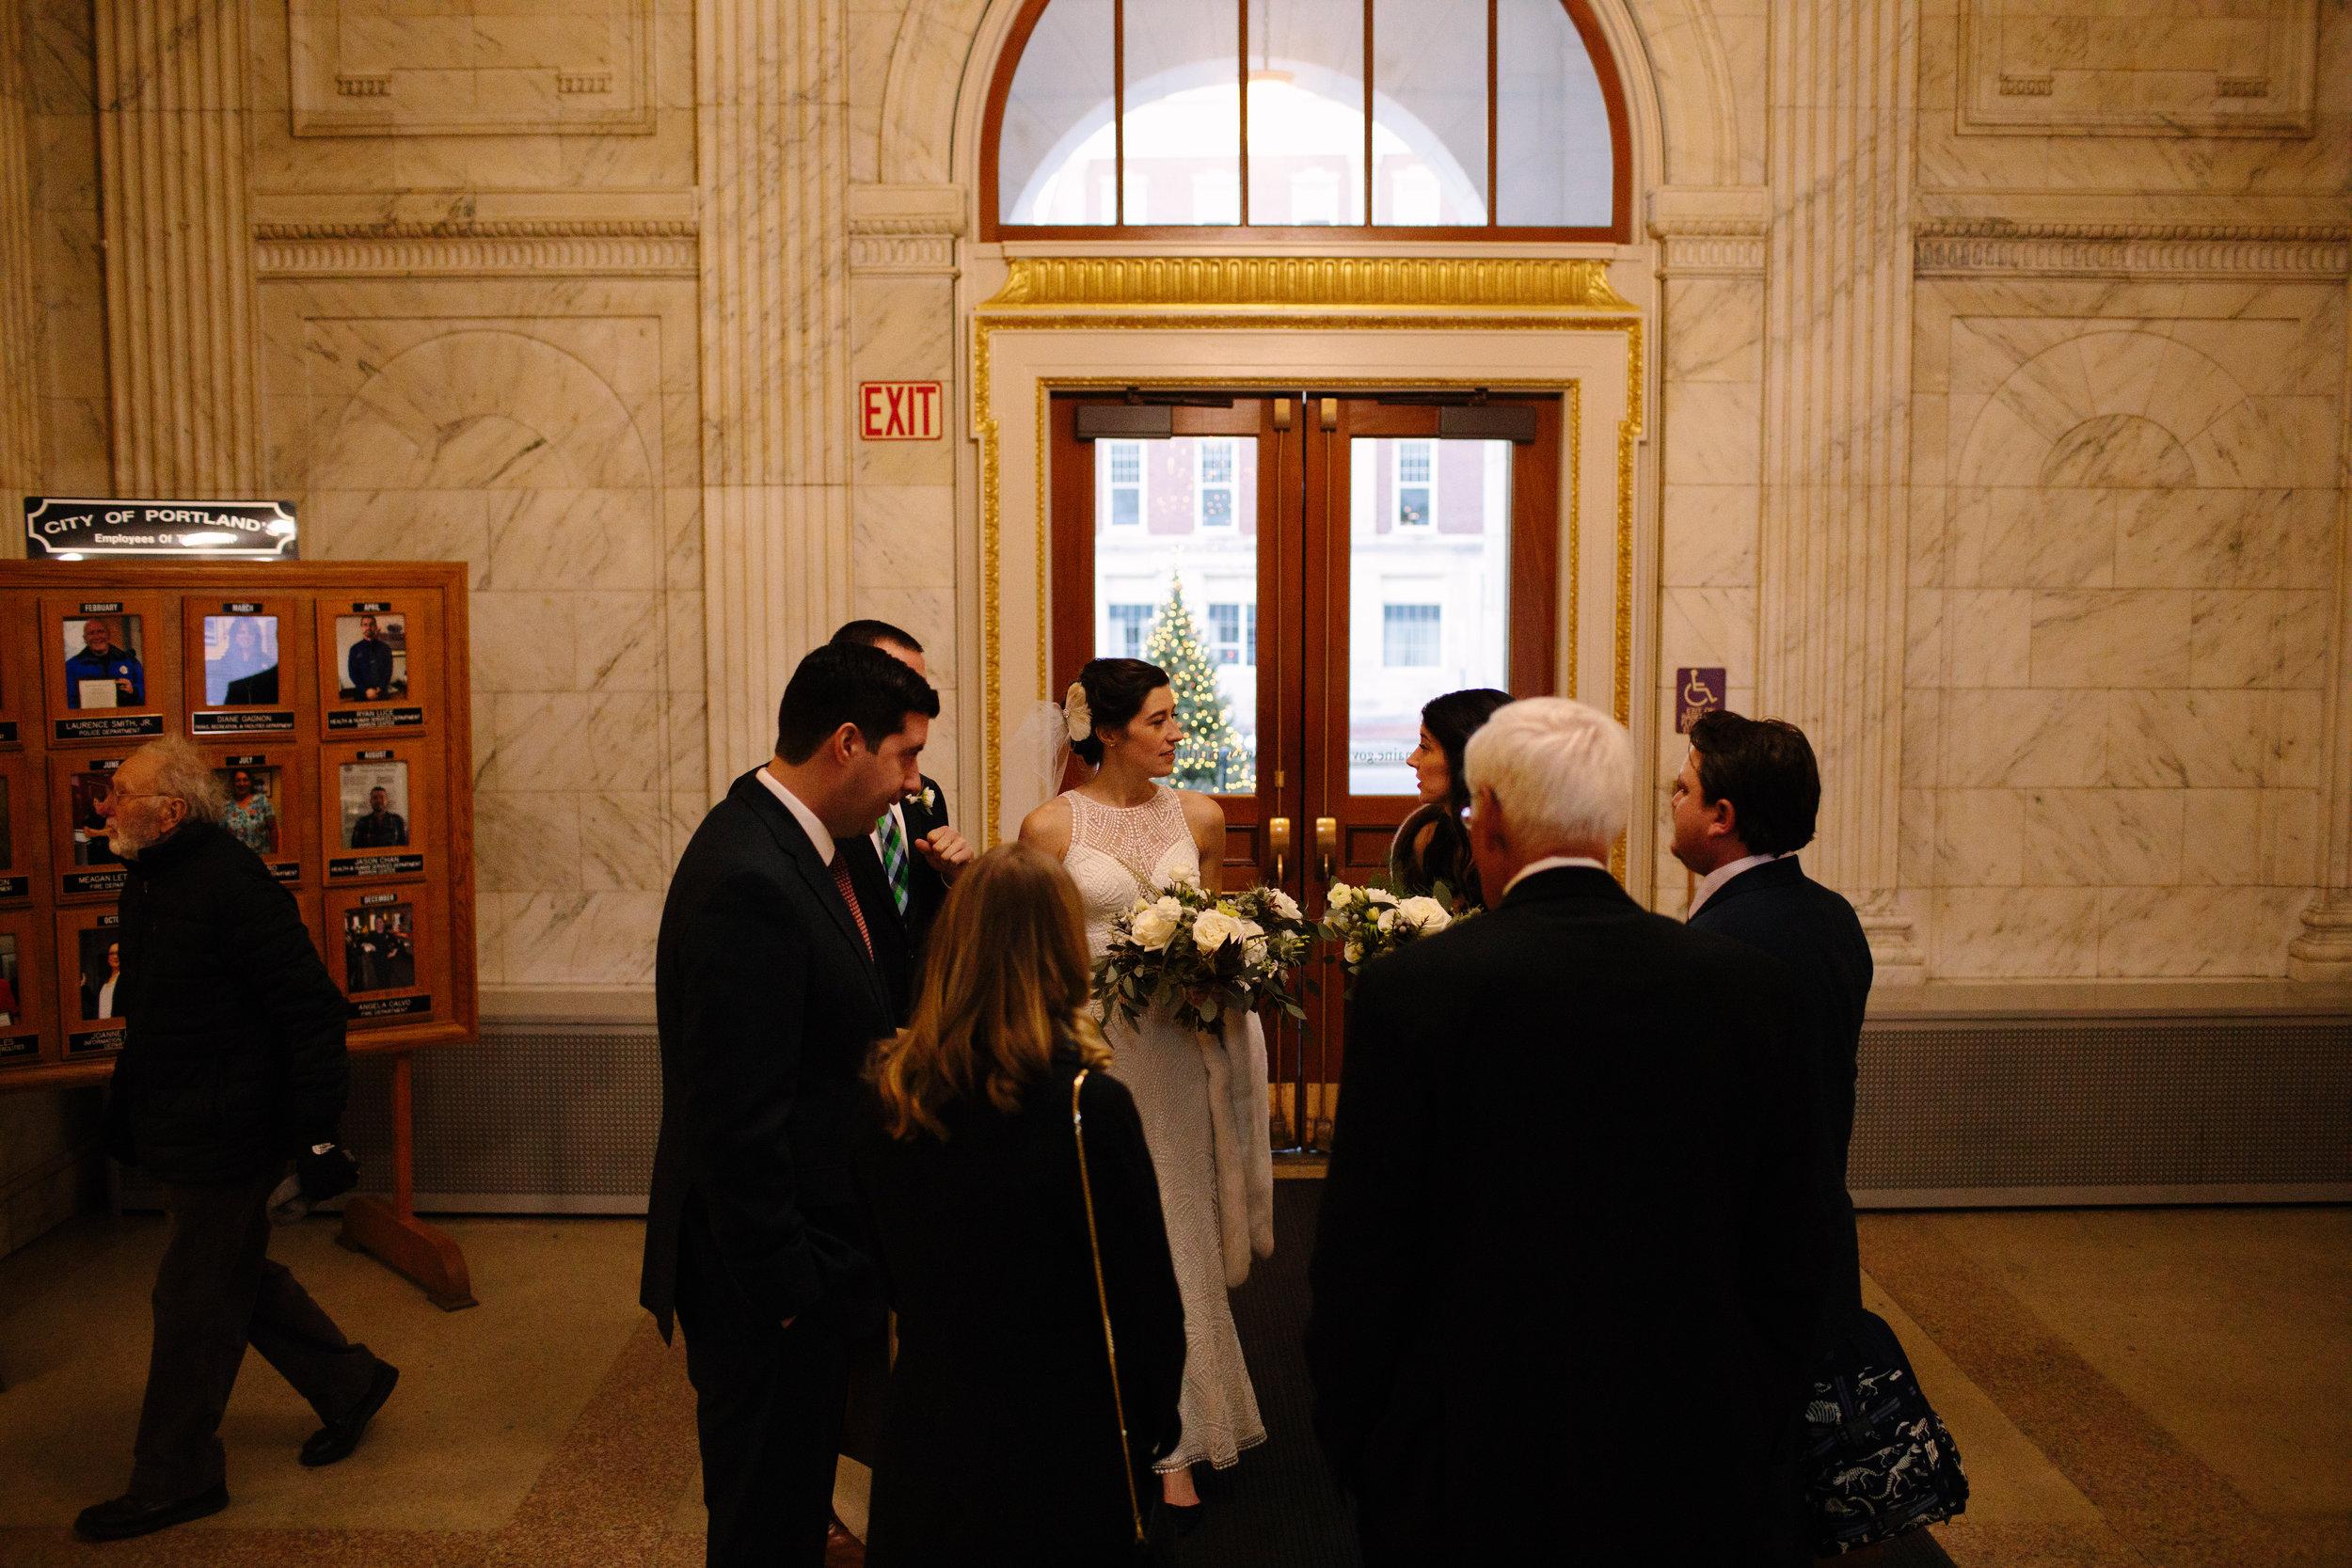 portland-maine-press-hotel-wedding-64.jpg